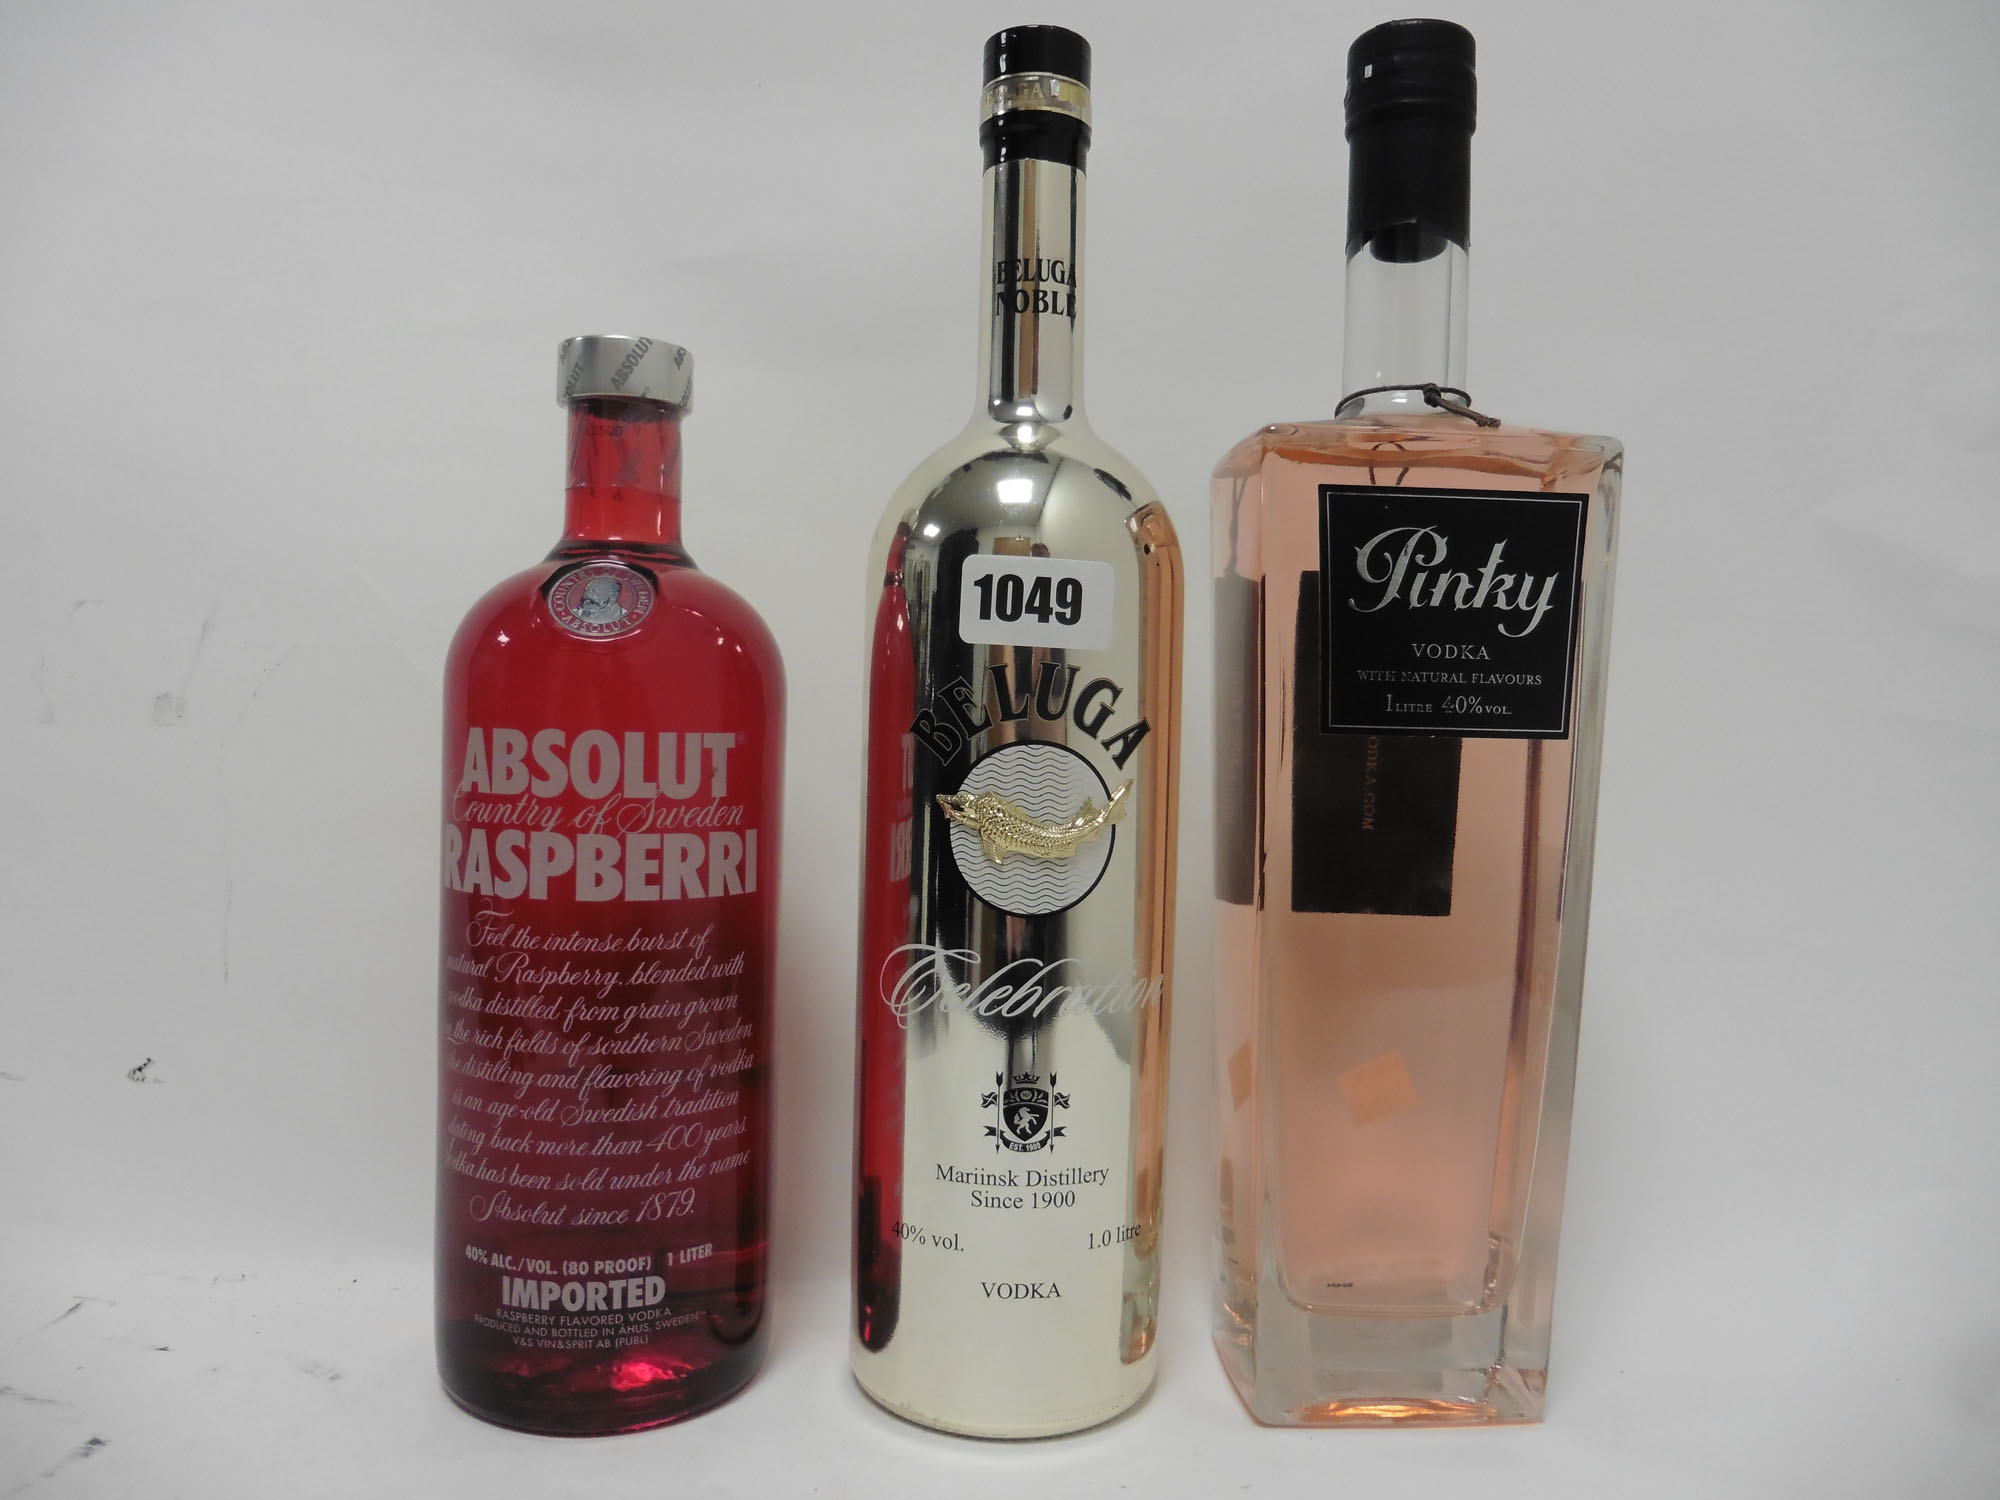 3 bottles of Vodka, 1x Beluga Noble Celebration Russian Vodka 1 litre 40%,